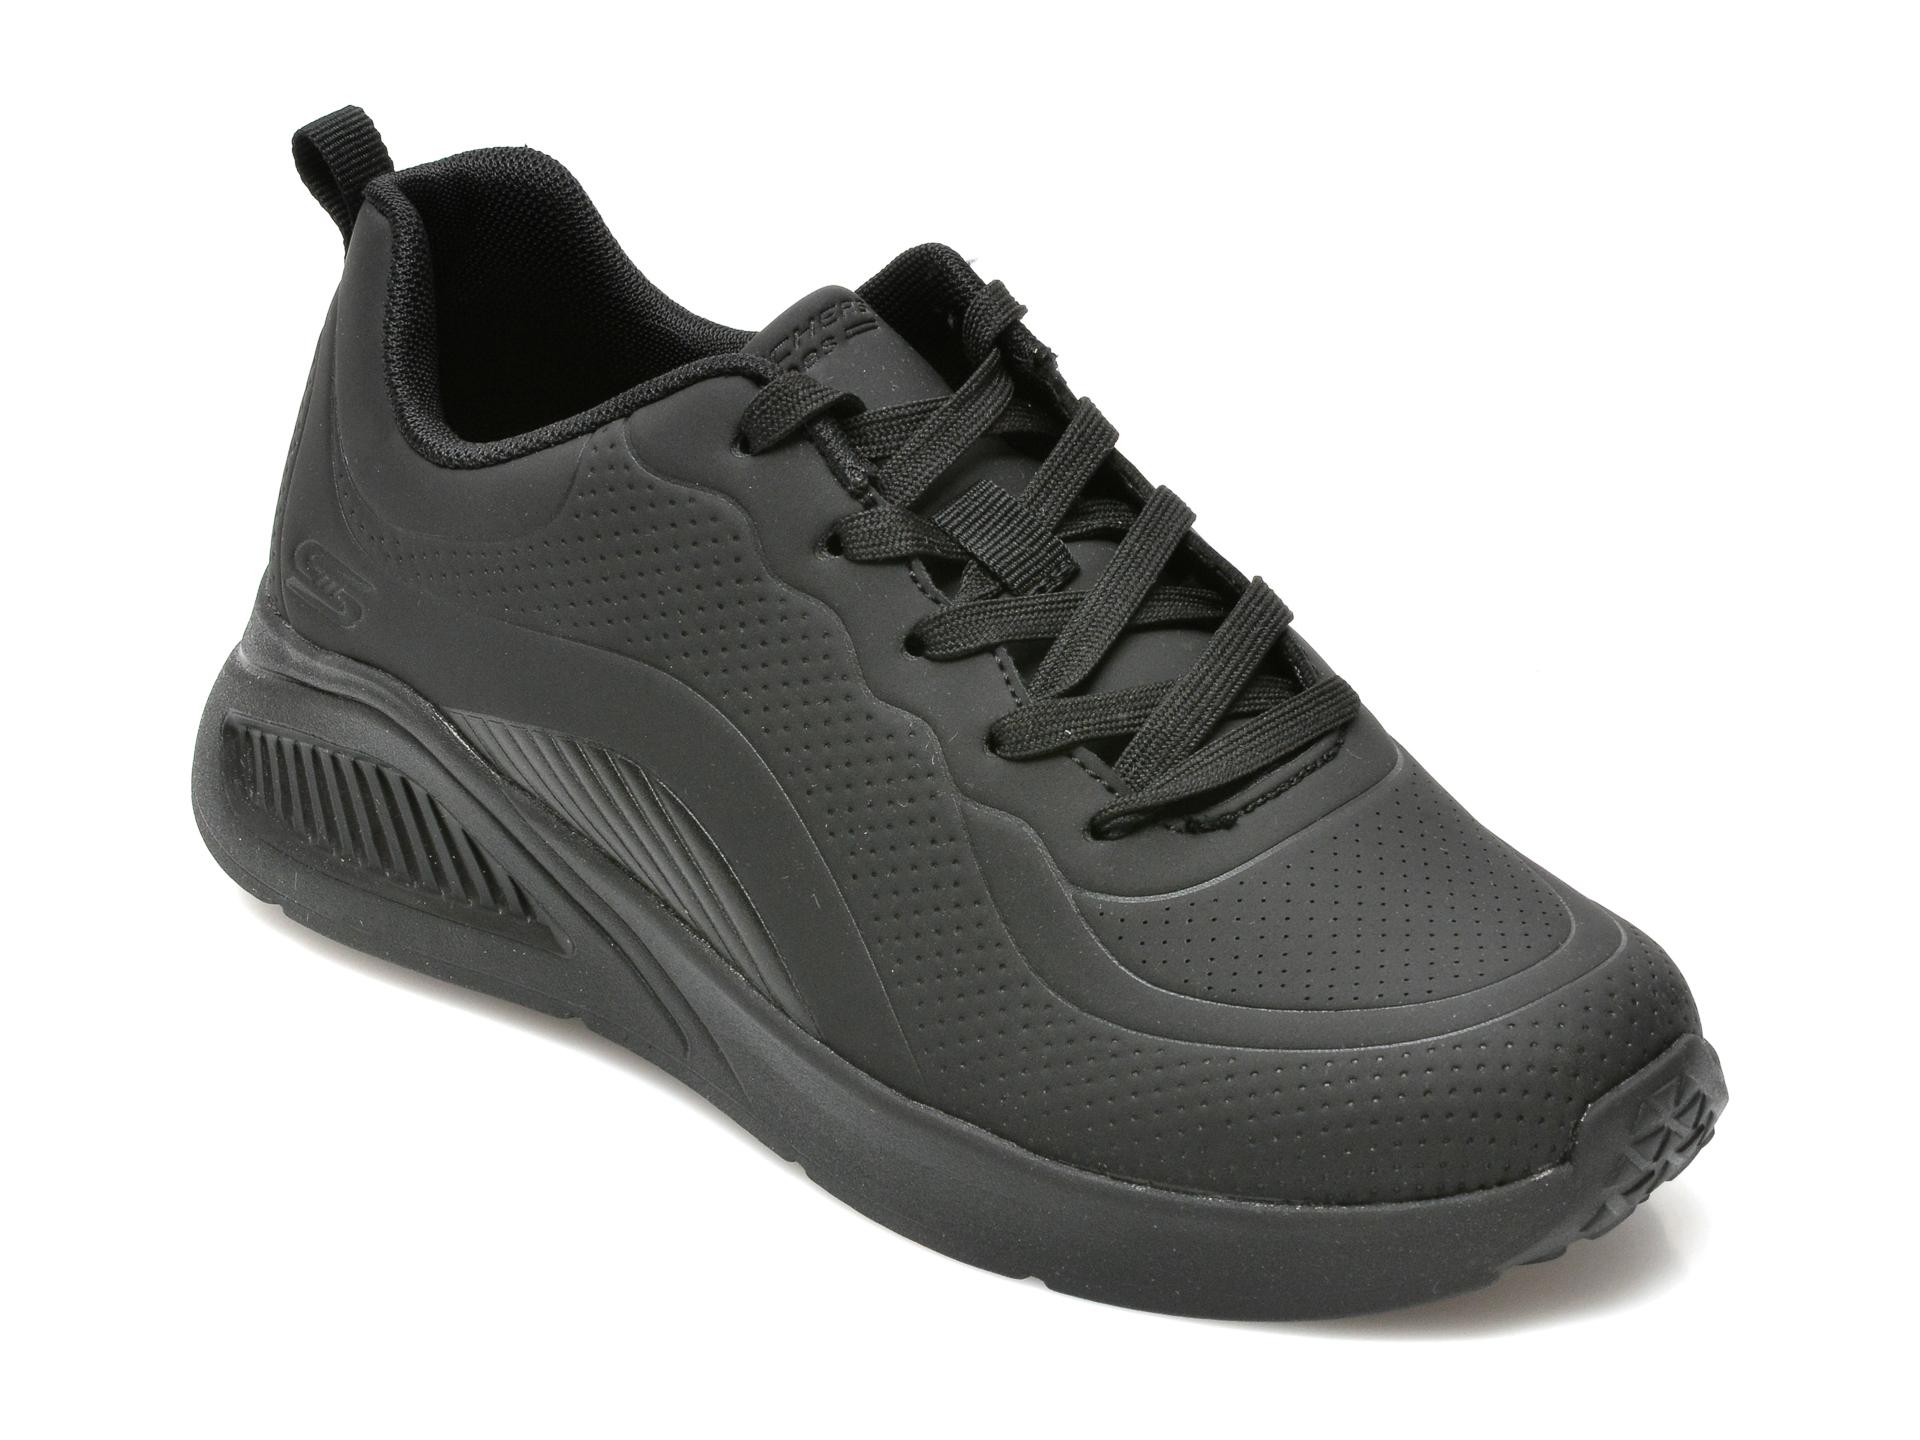 Pantofi Sport Skechers Negri, Bobs Buno, Din Piele Ecologica